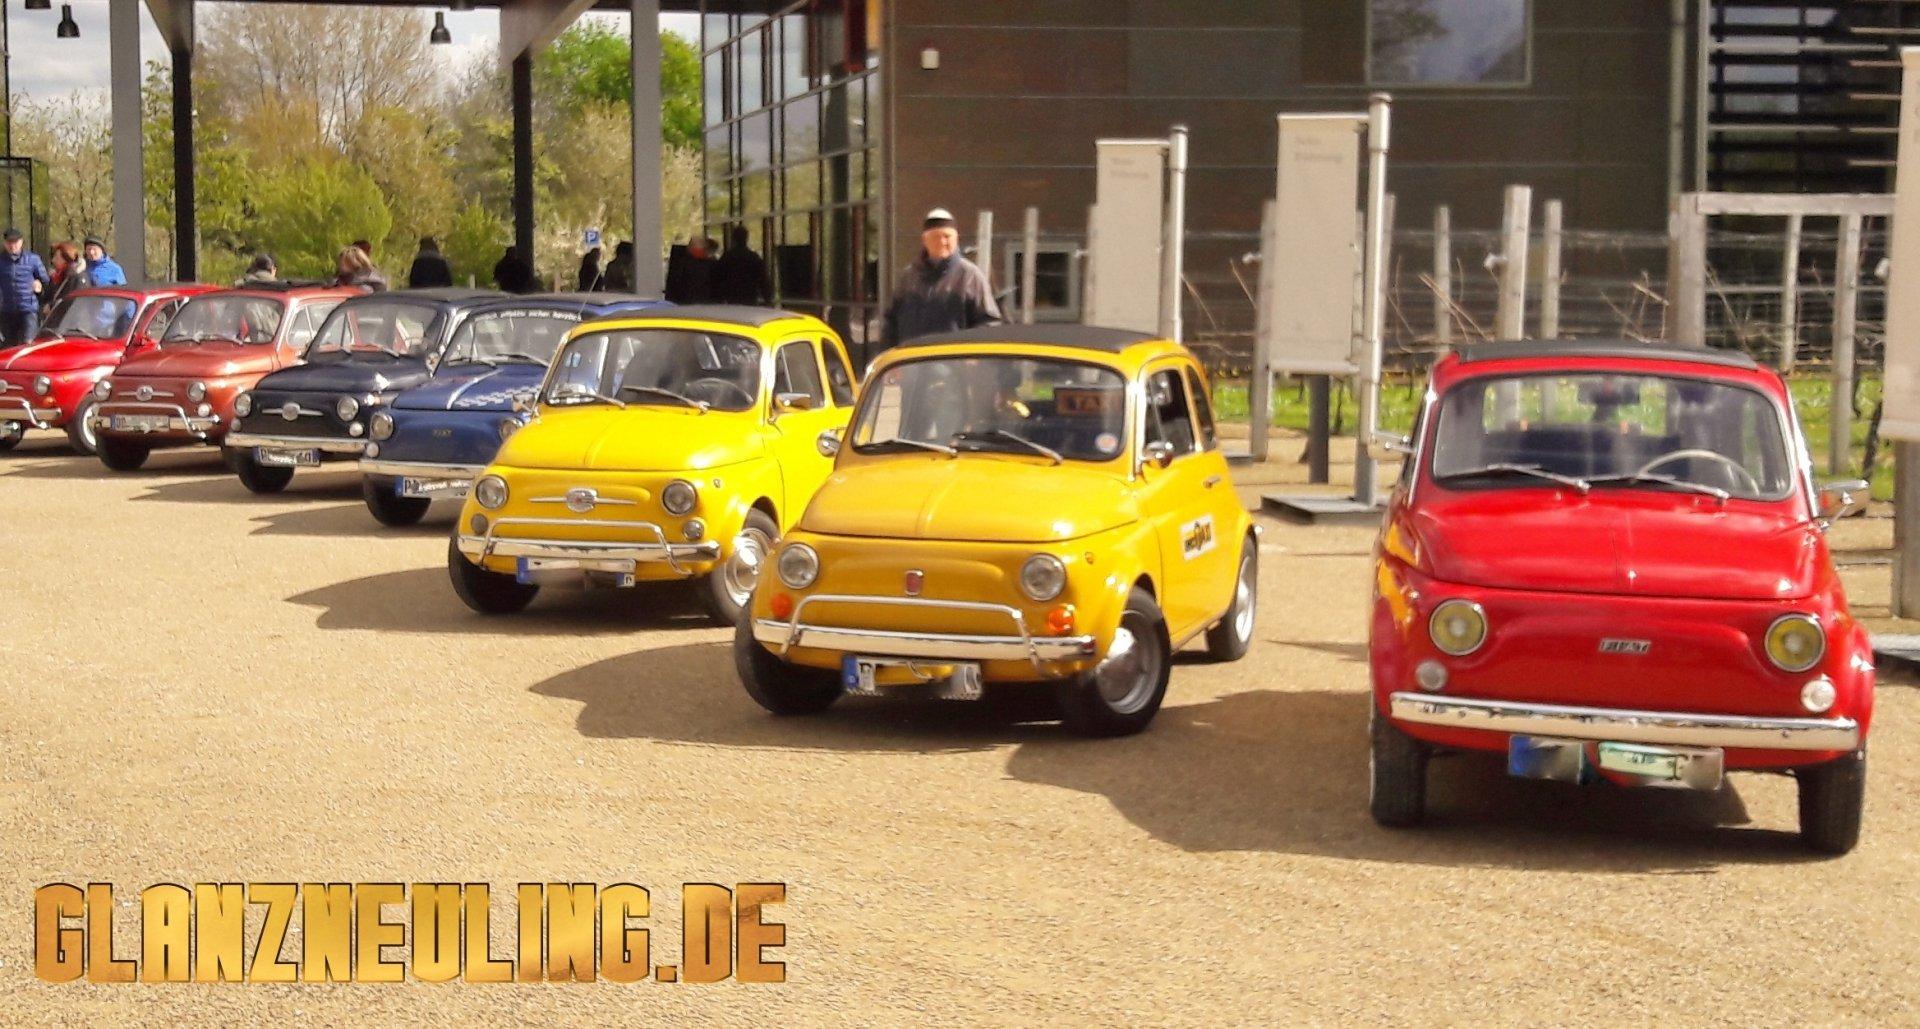 italienische Autos mieten Taxi mieten gelb Dresden, Berlin Leipzig Sachsen